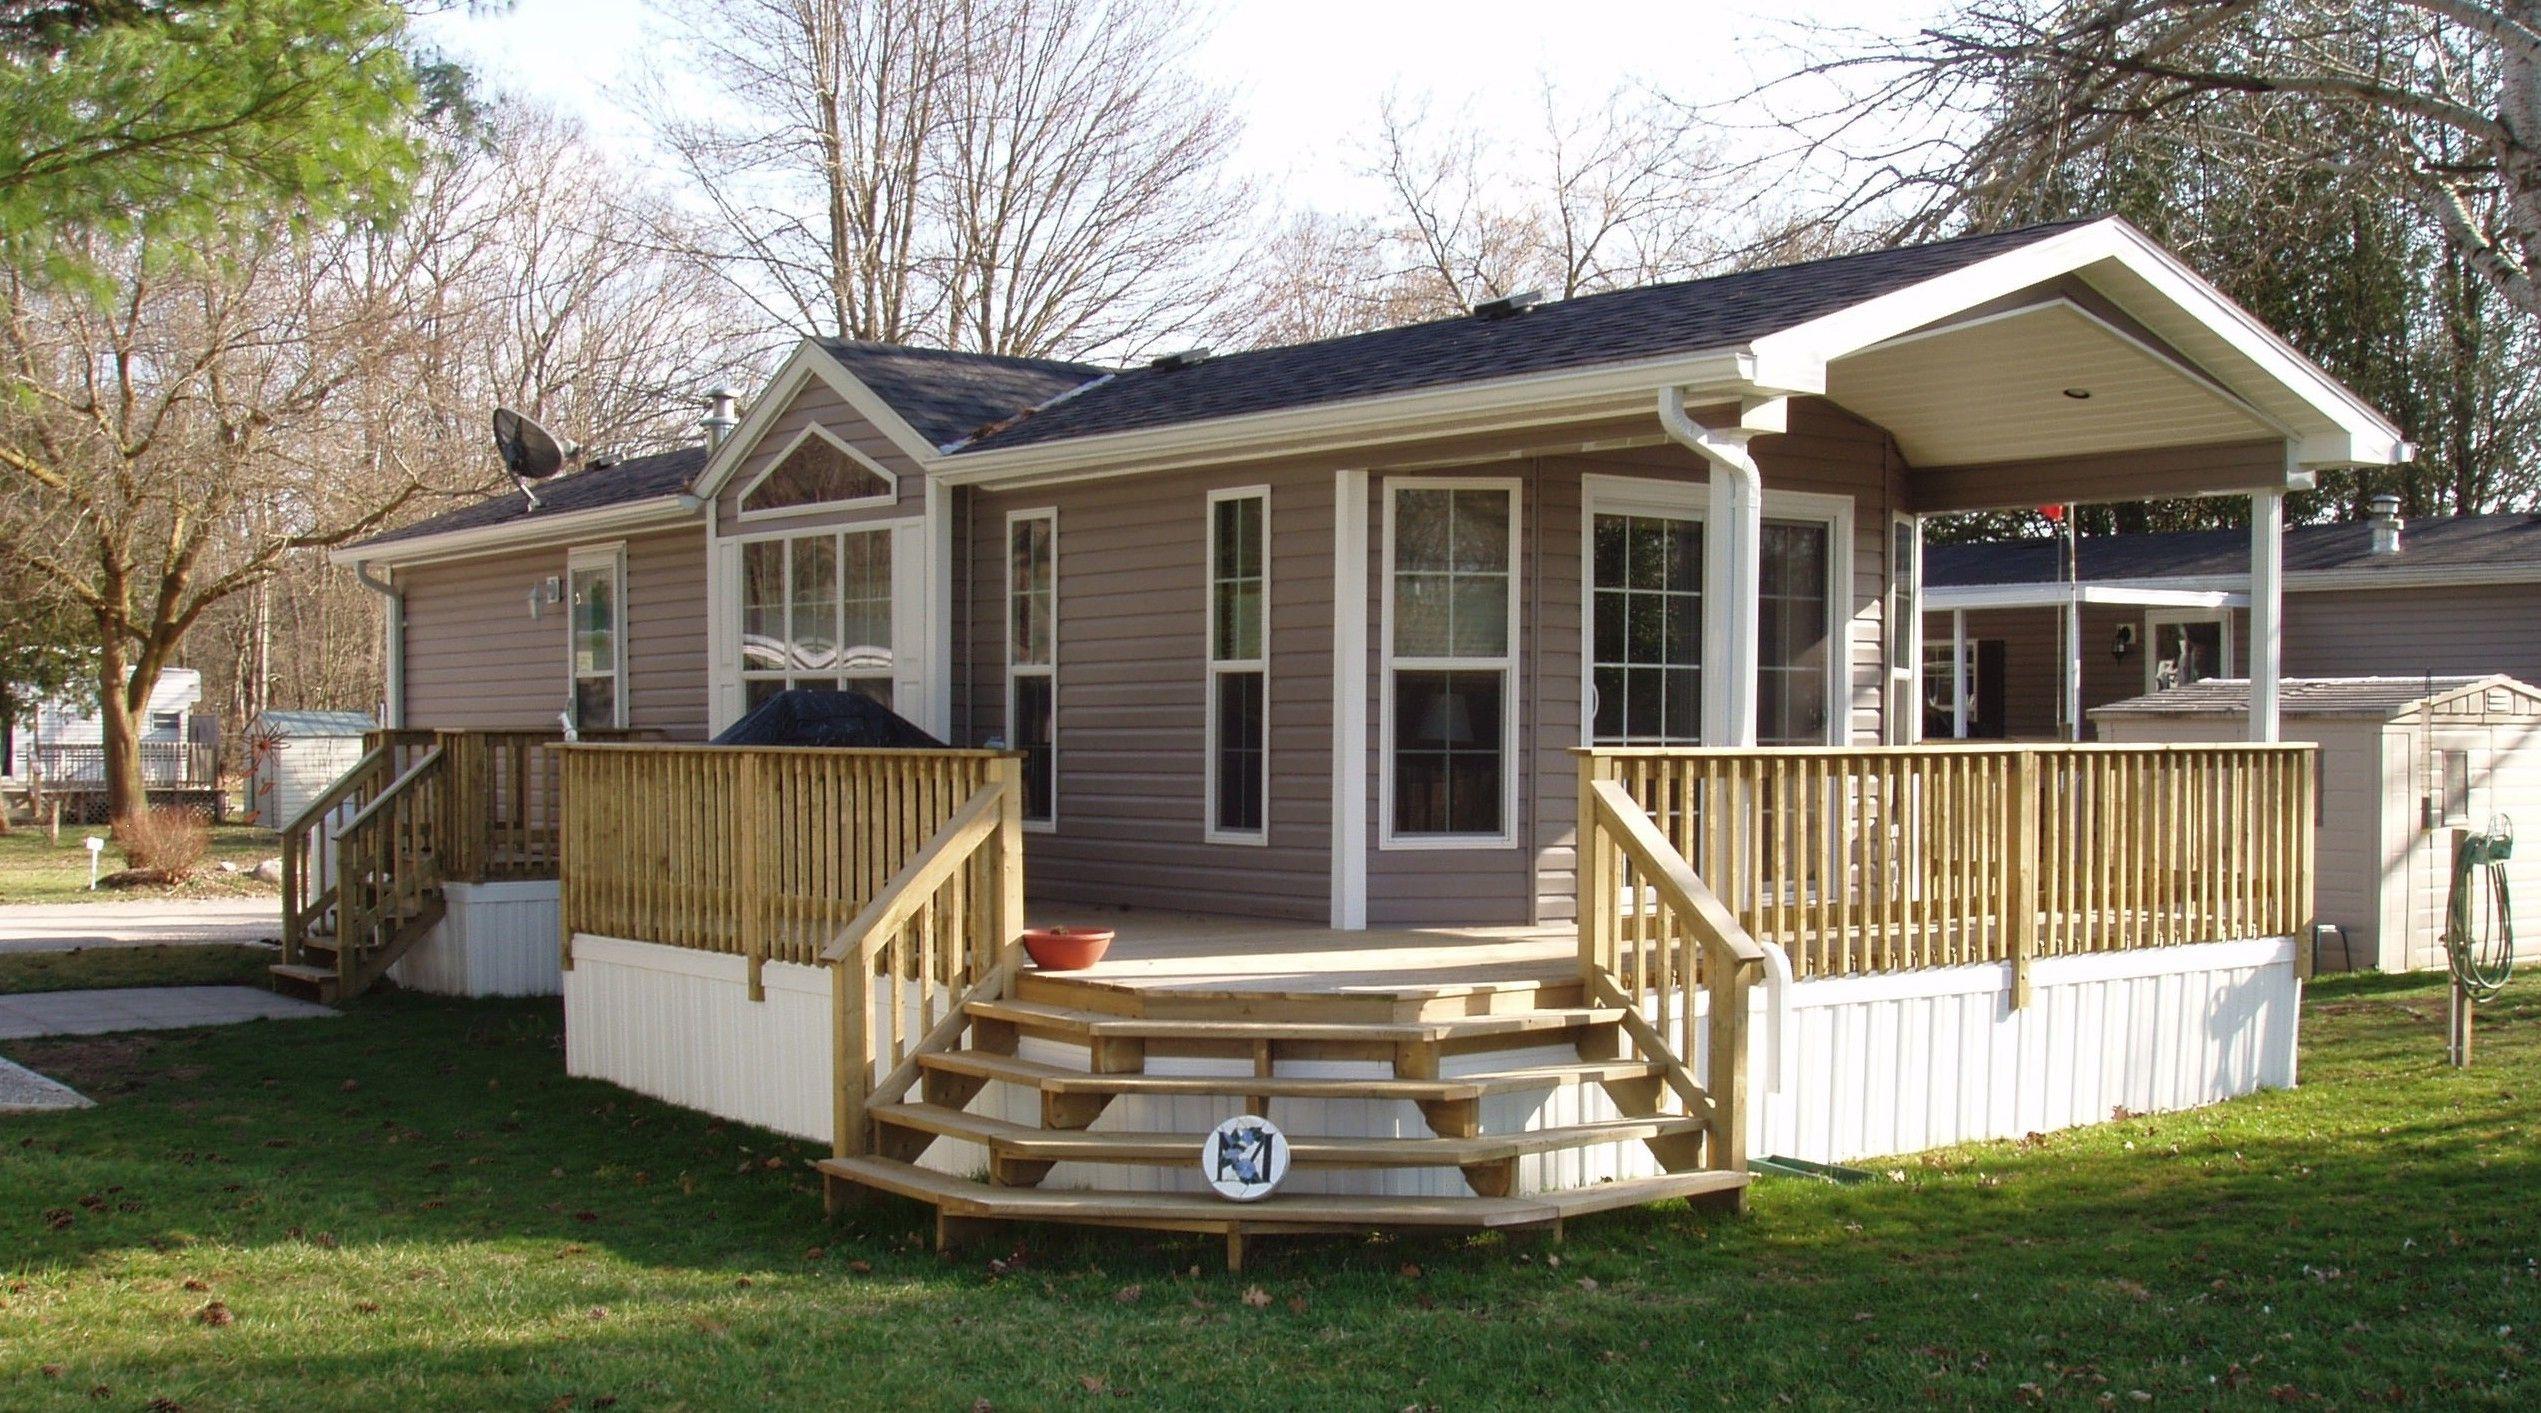 one-bedroom-modular-homes-with-measurements-2541-x-1413.jpg 2,541 ...